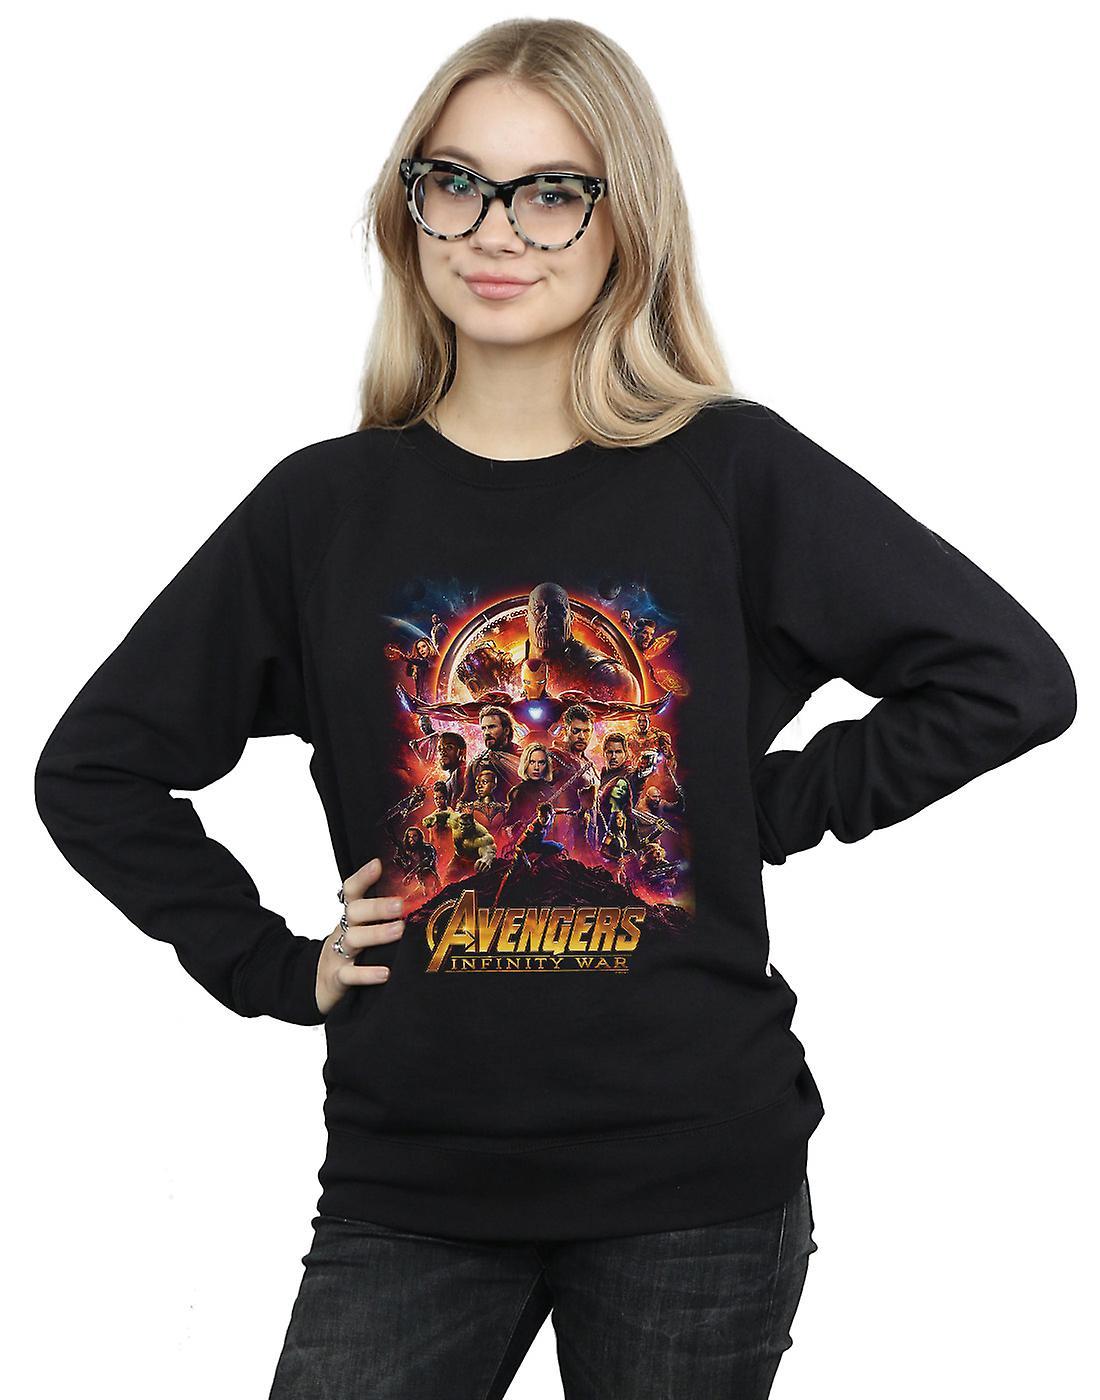 Marvel Women's Avengers Infinity War Movie Poster Sweatshirt